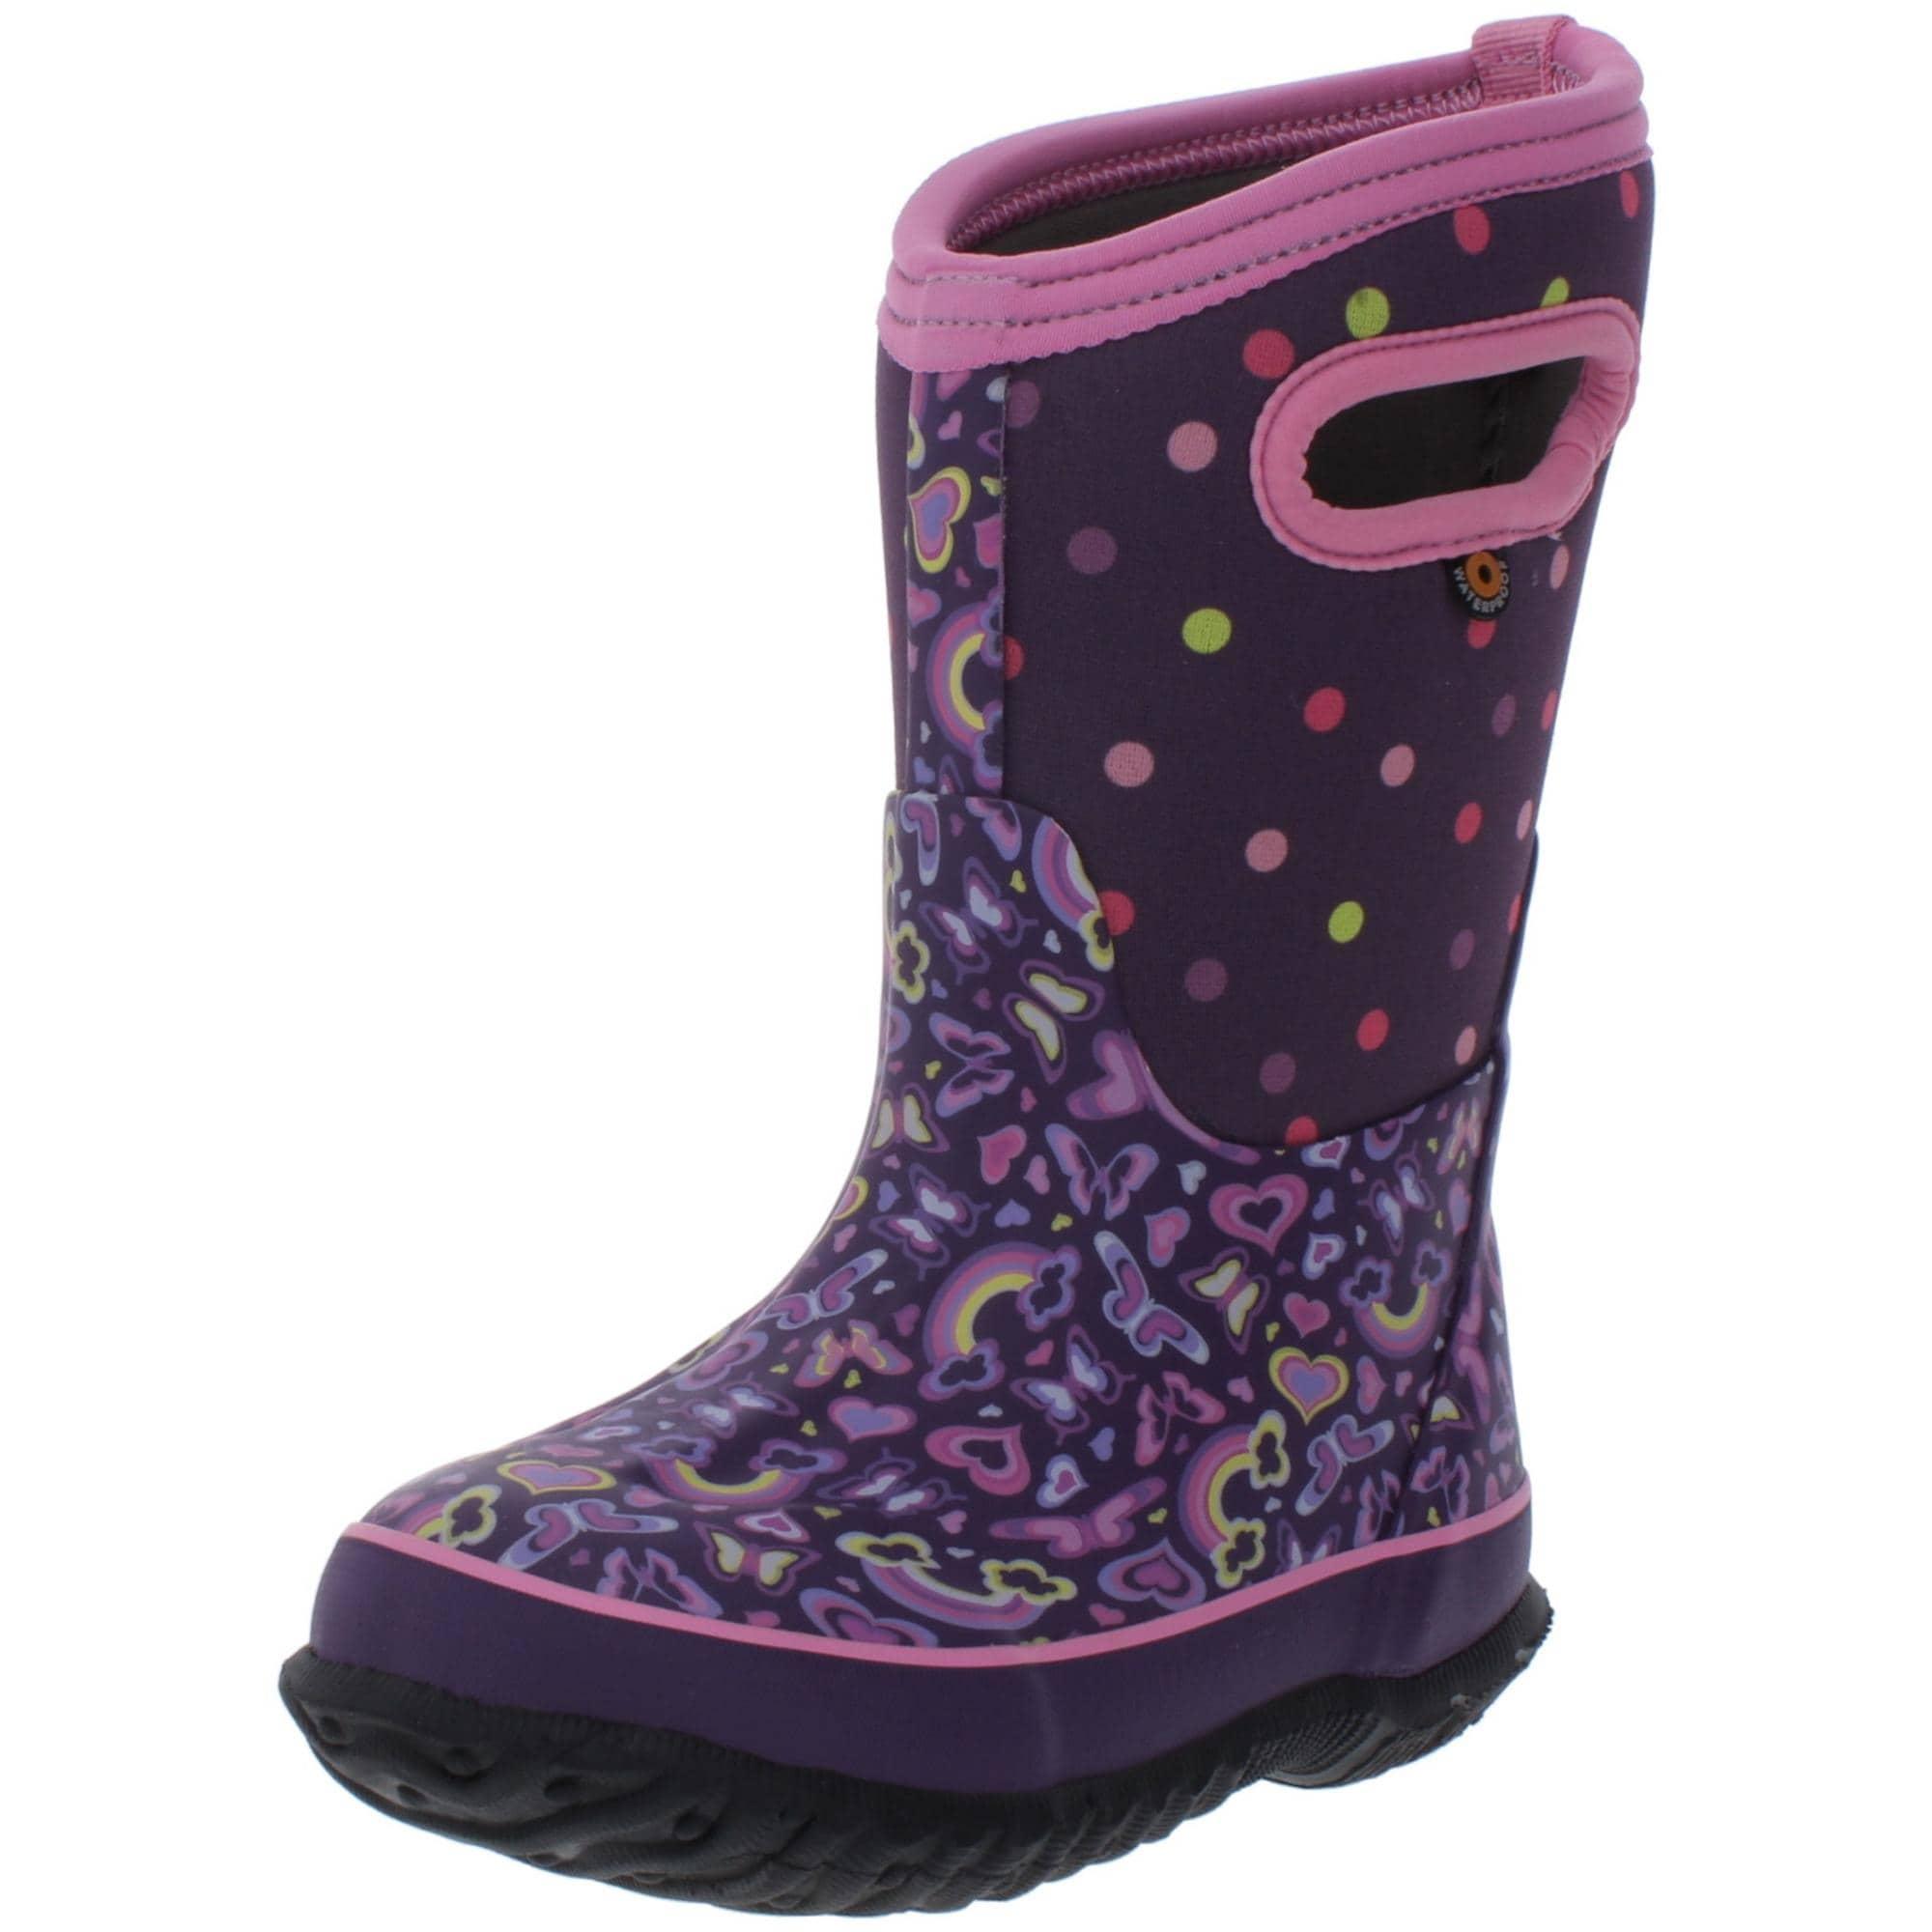 Shop Bogs Girls Classic Rainbow Winter